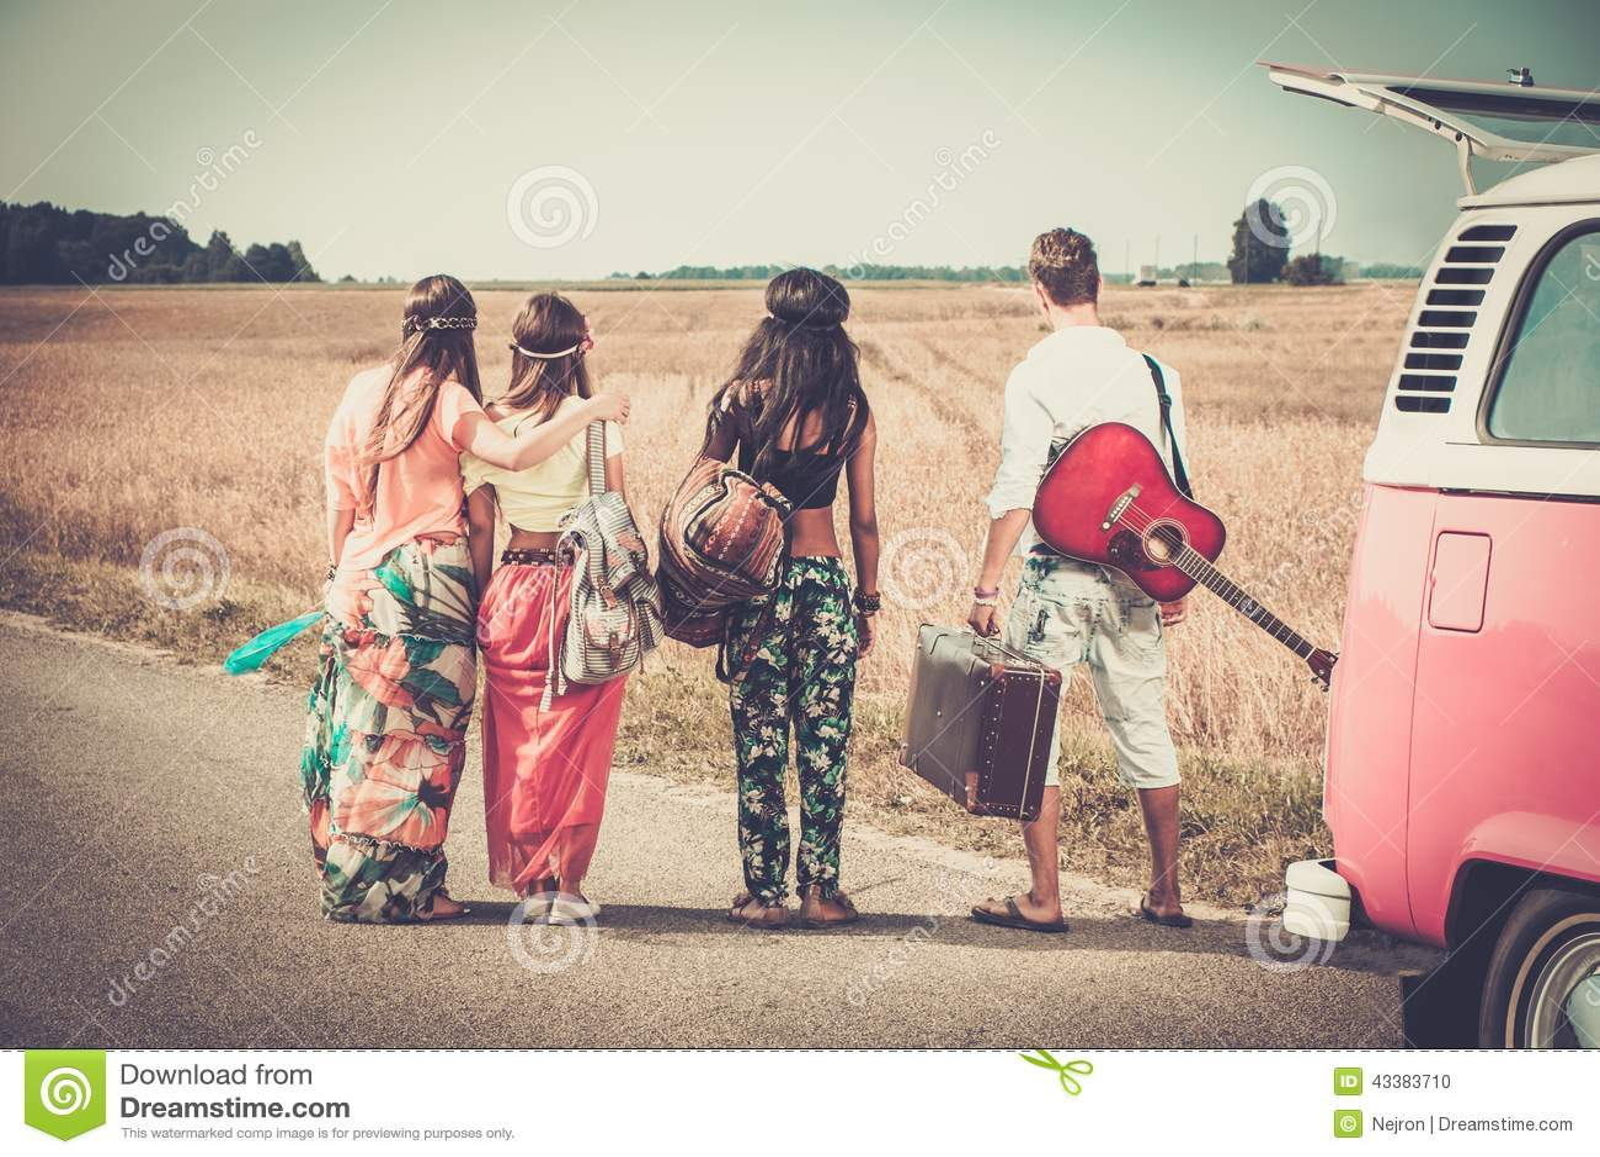 Multi Ethnic Hippie Friends On A Road Trip